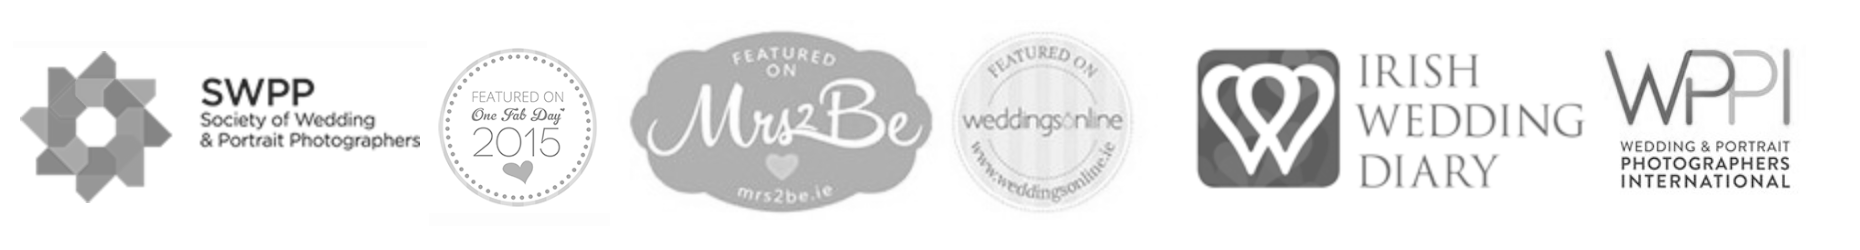 affliations - award-winning irish wedding photographers